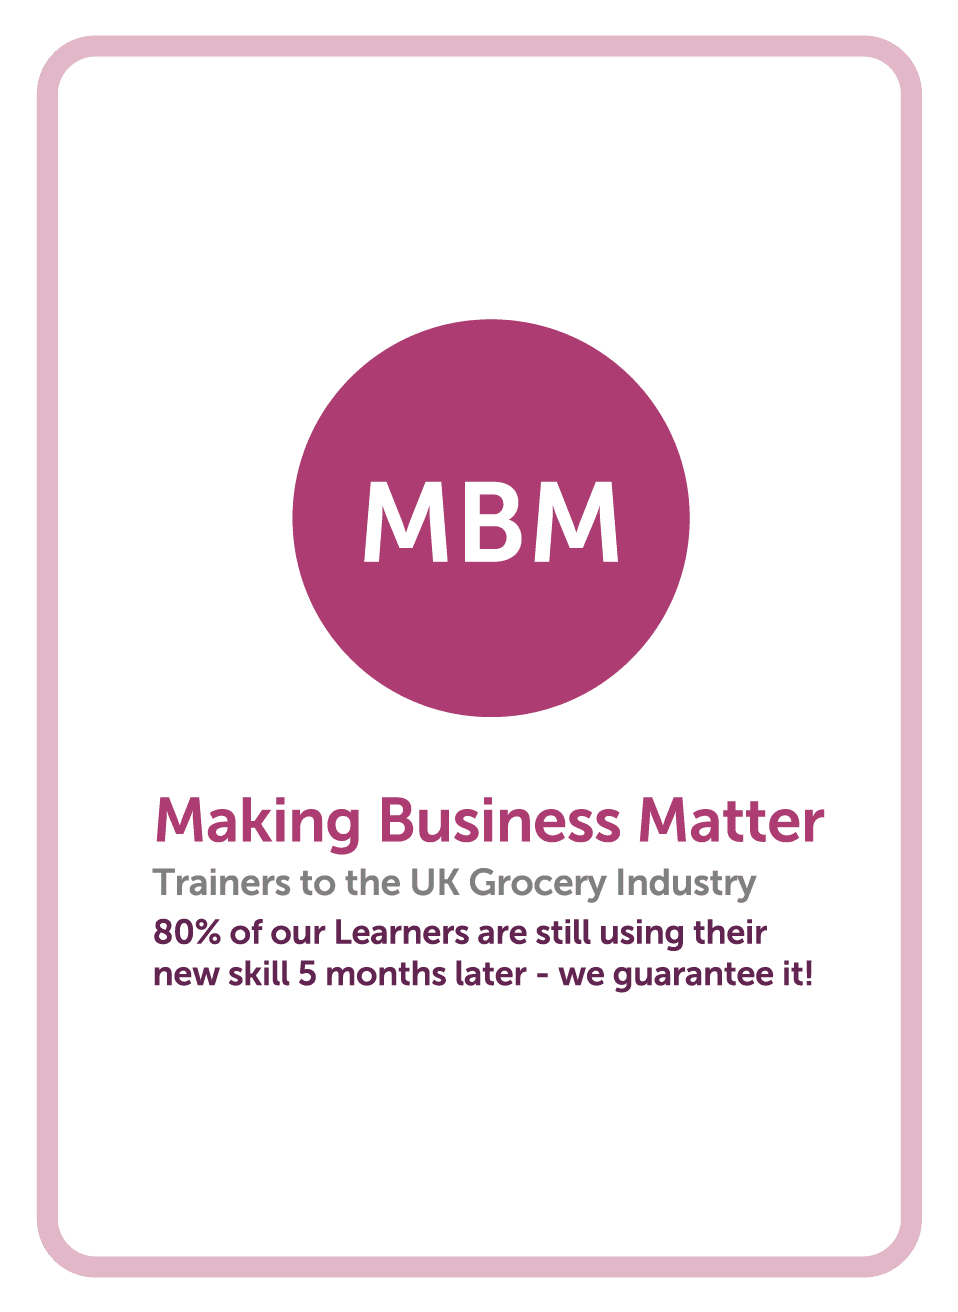 Category management coaching card titled MBM